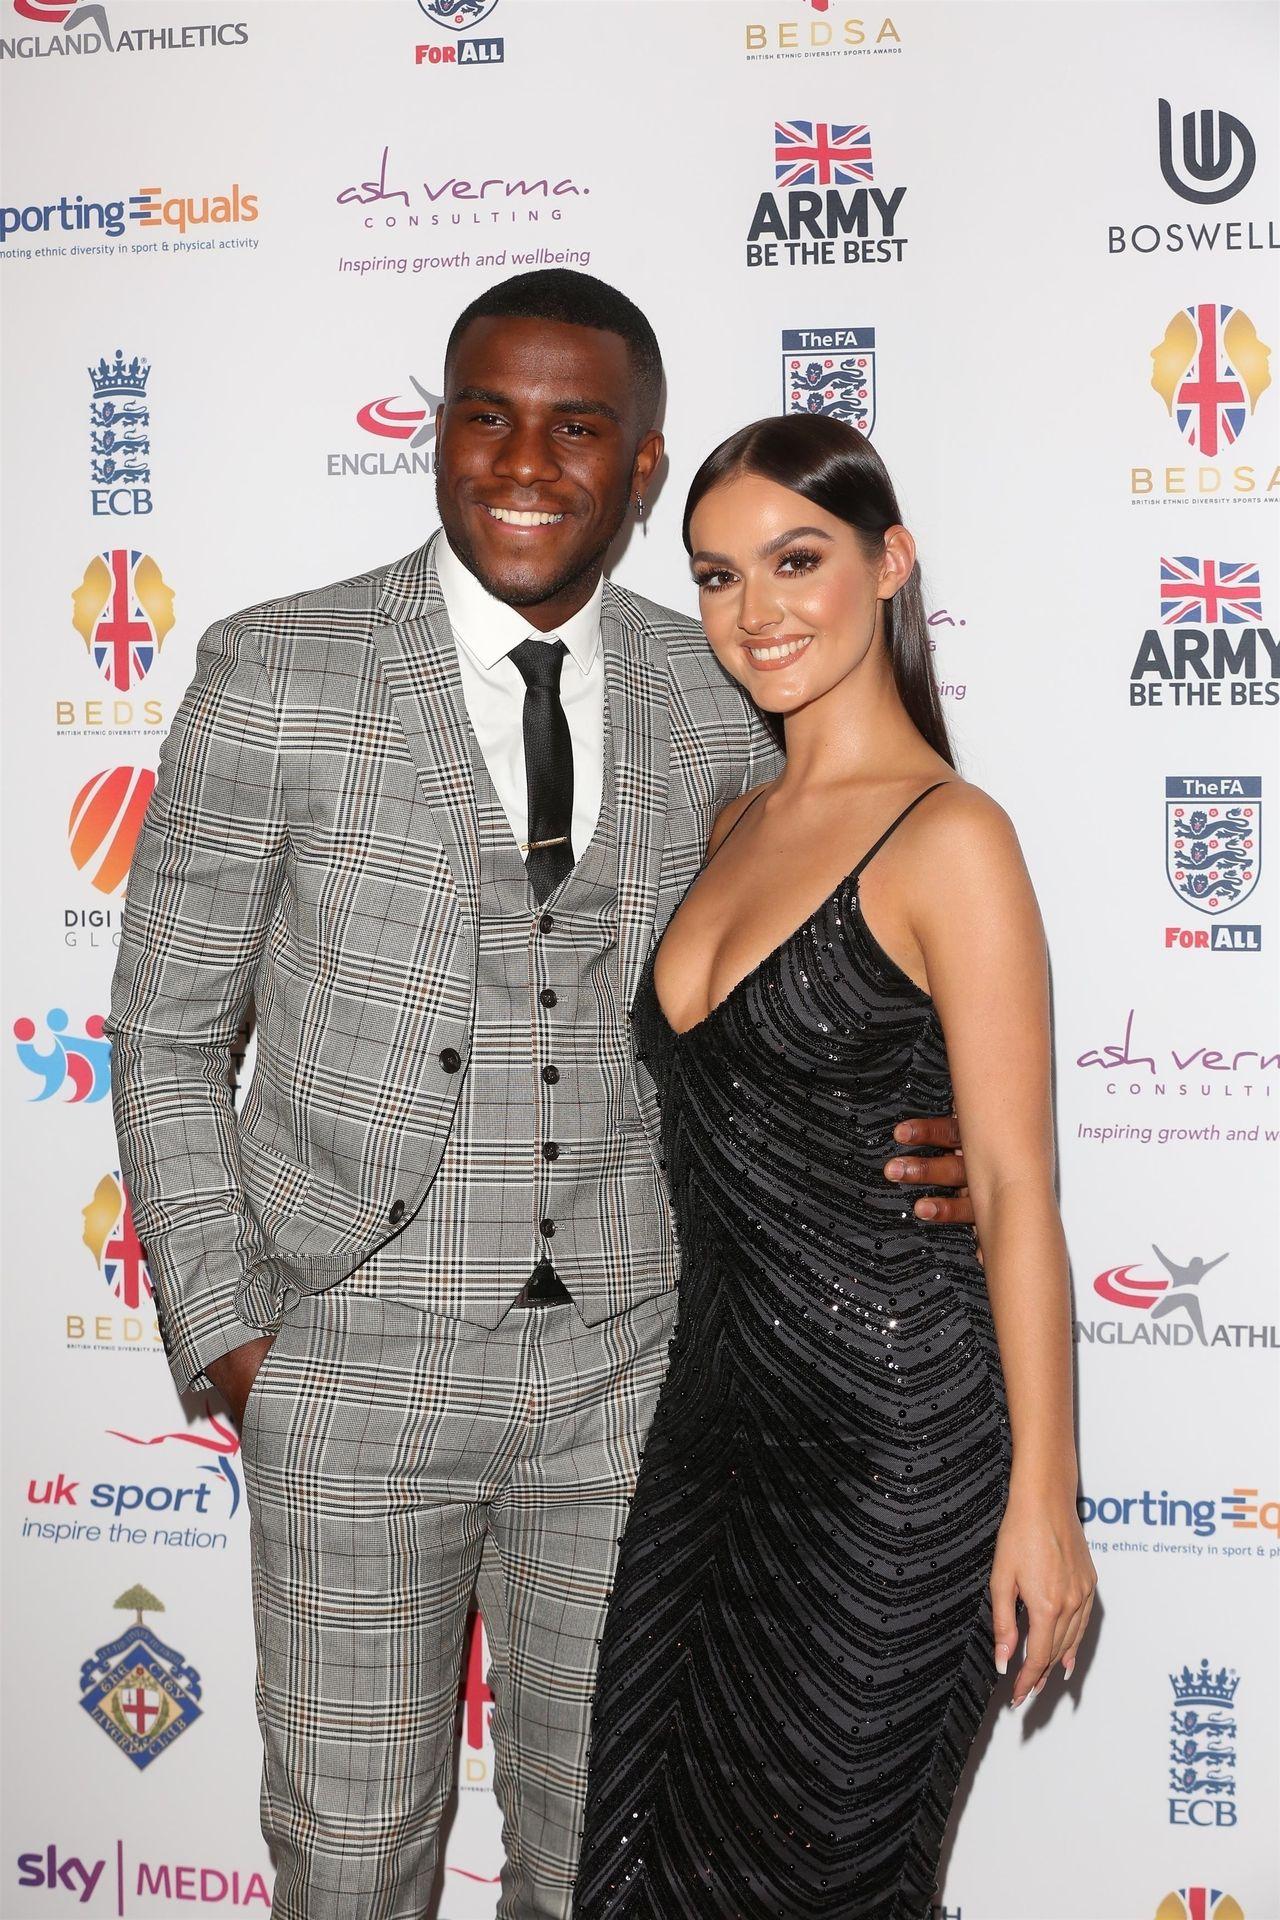 Siannise Fudge & Luke Trotman Are Seen At British Ethnic Diversity Sports Awards 0058